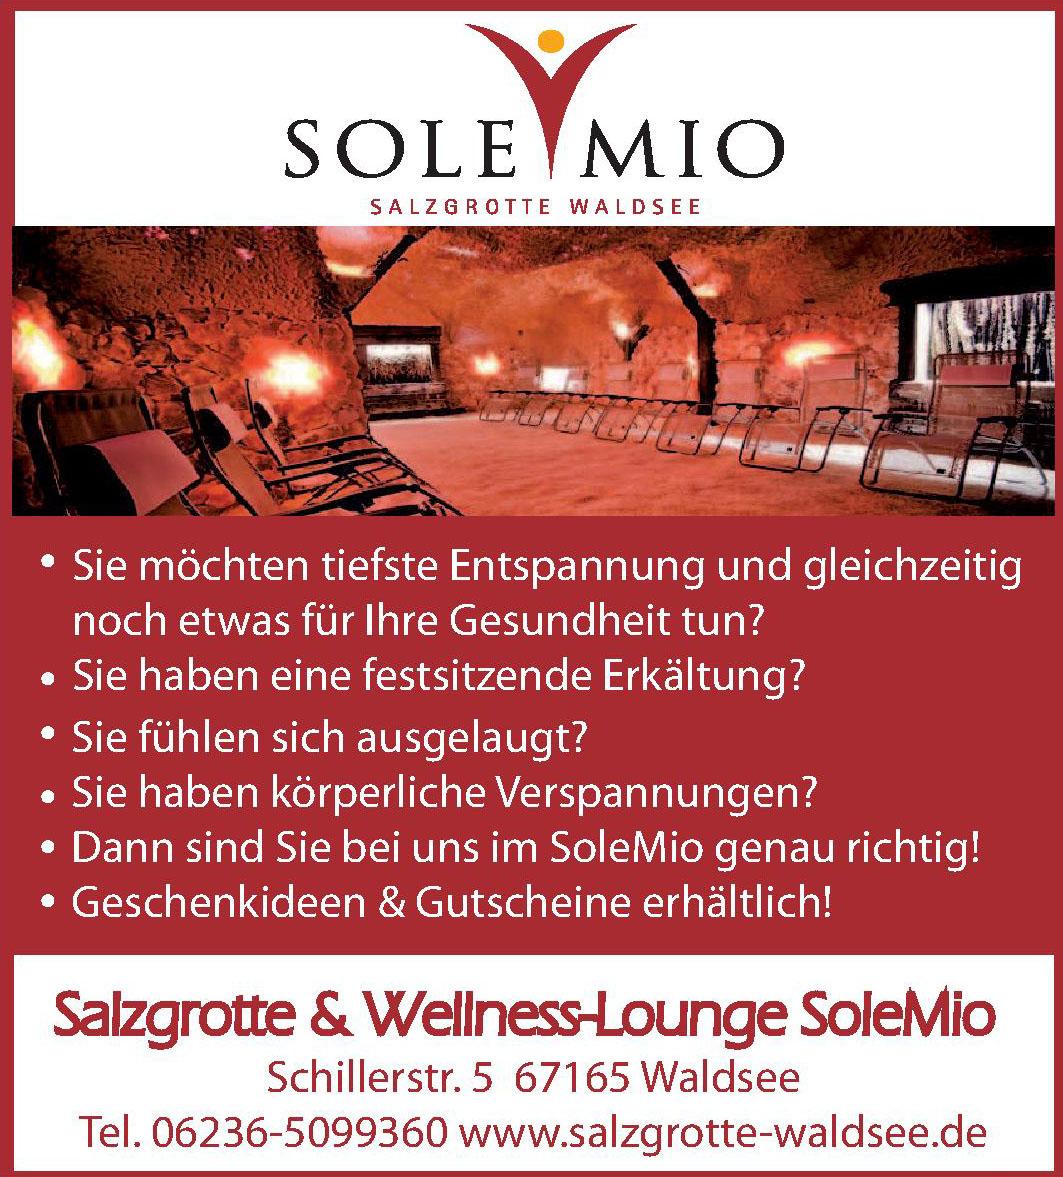 Salz- & Wellness-Lounge-SoleMio